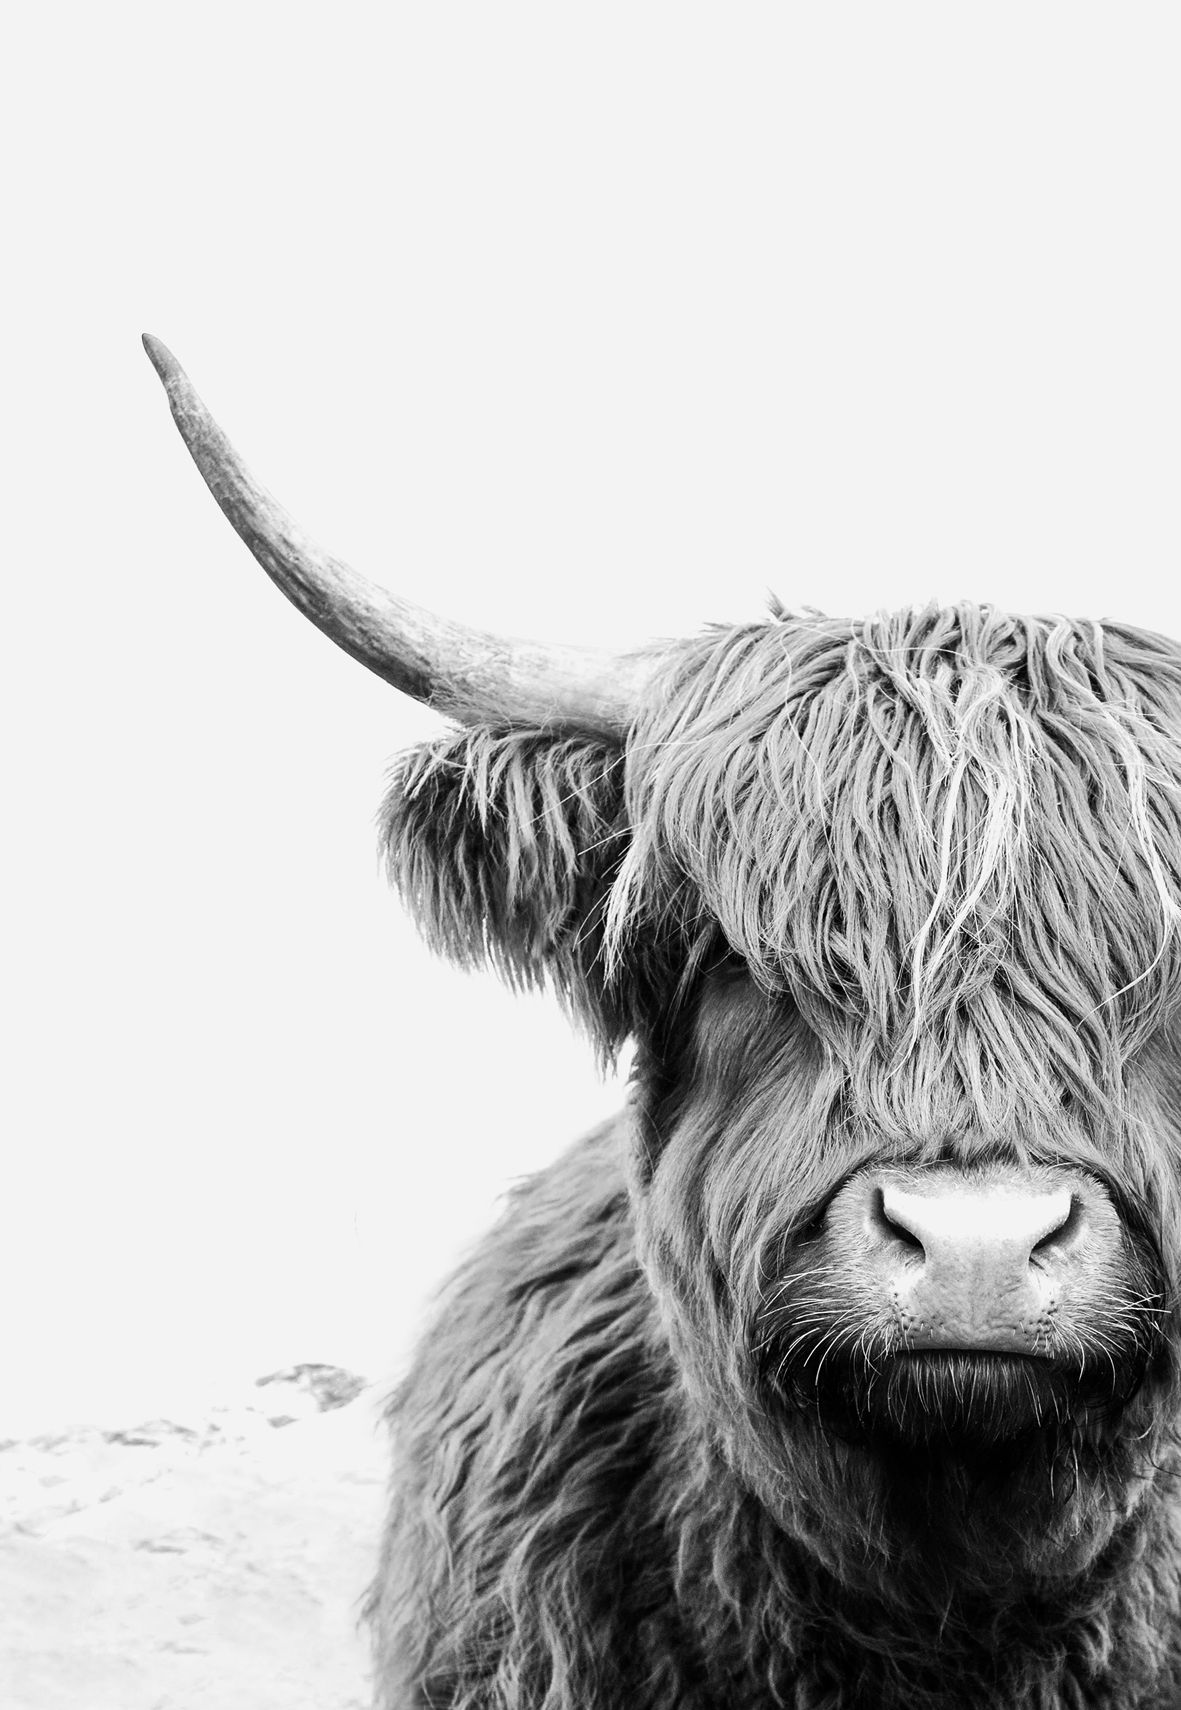 Animal Head Highland Cow Wall Mounted Desresdesign Highland Cow Art Cow Craft Highland Cow